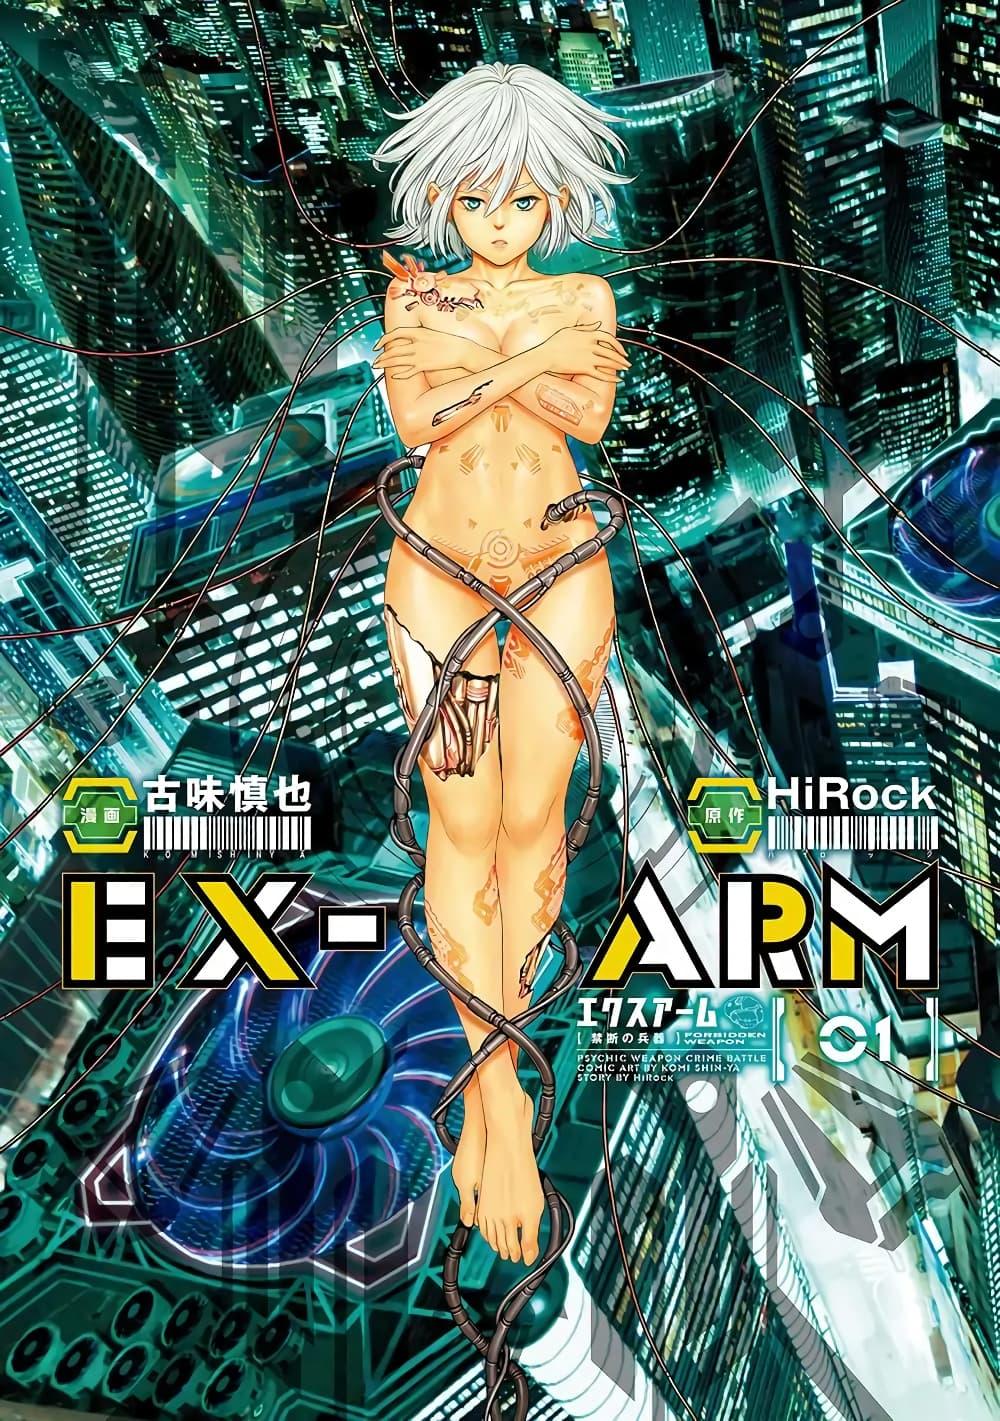 EX-ARM ตอนที่ 1 อาวุธต้องห้าม